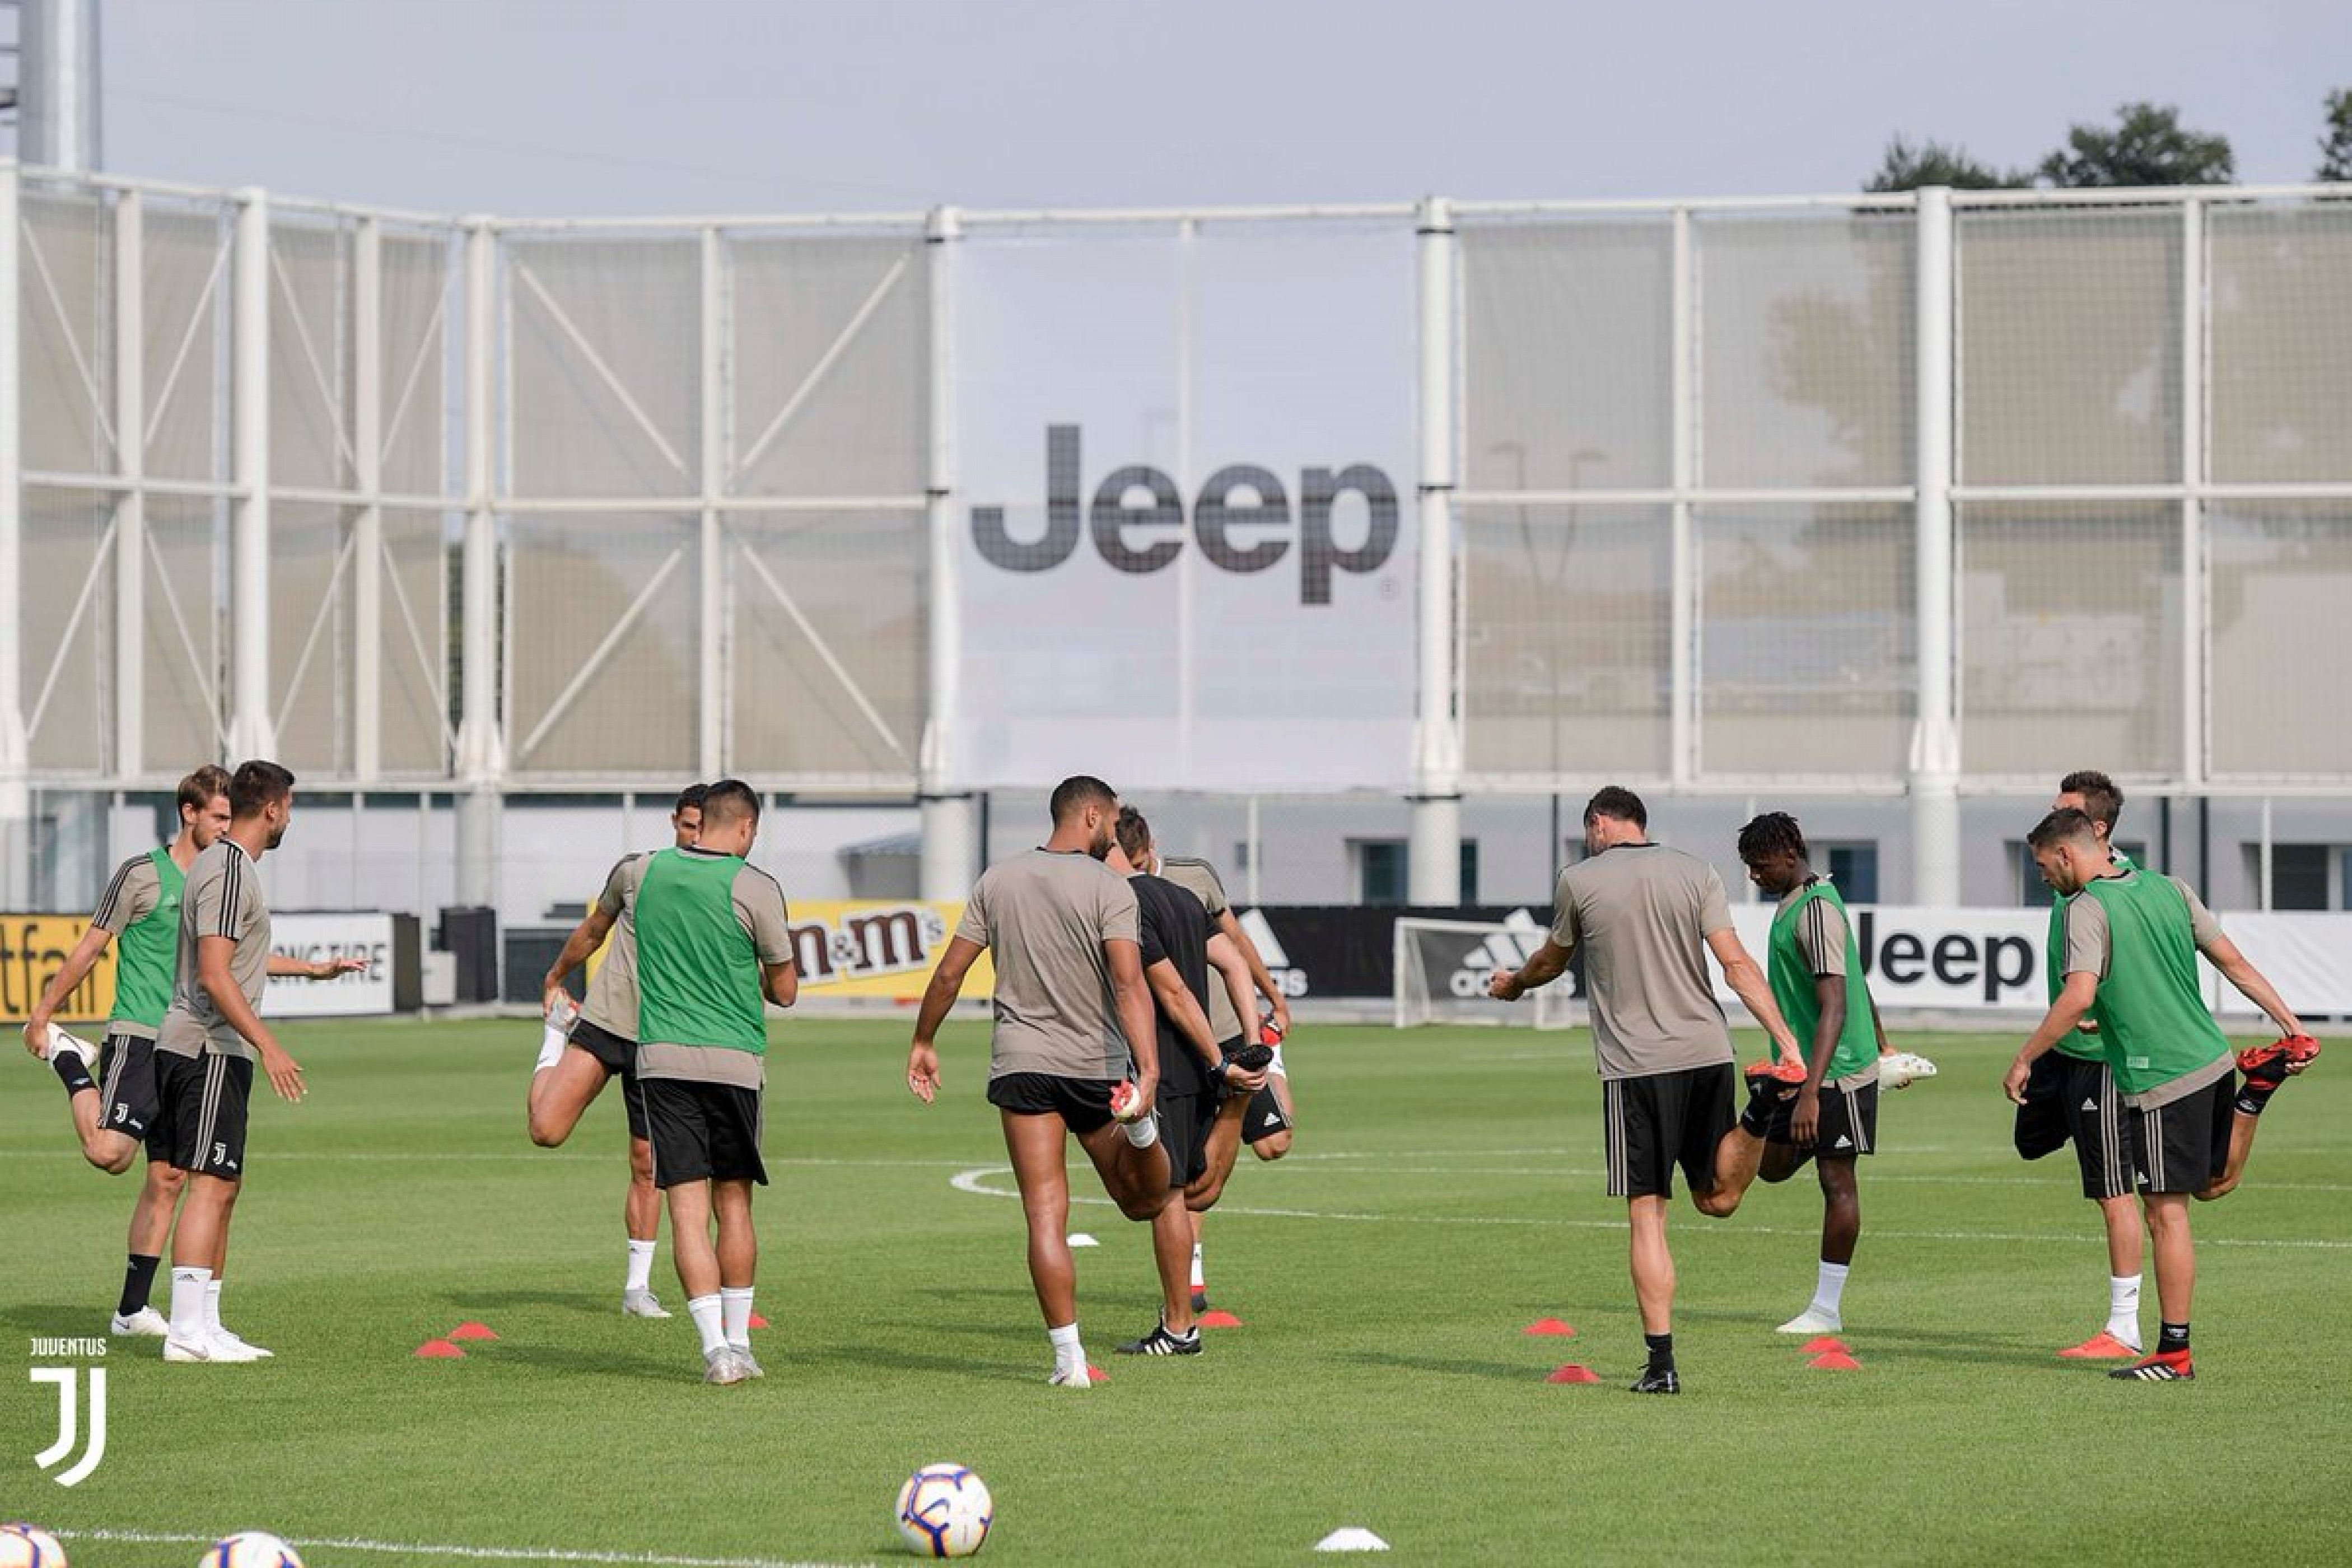 Juventus: oggi allenamento pomeridiano, Allegri valuta Mandzukic e Dybala